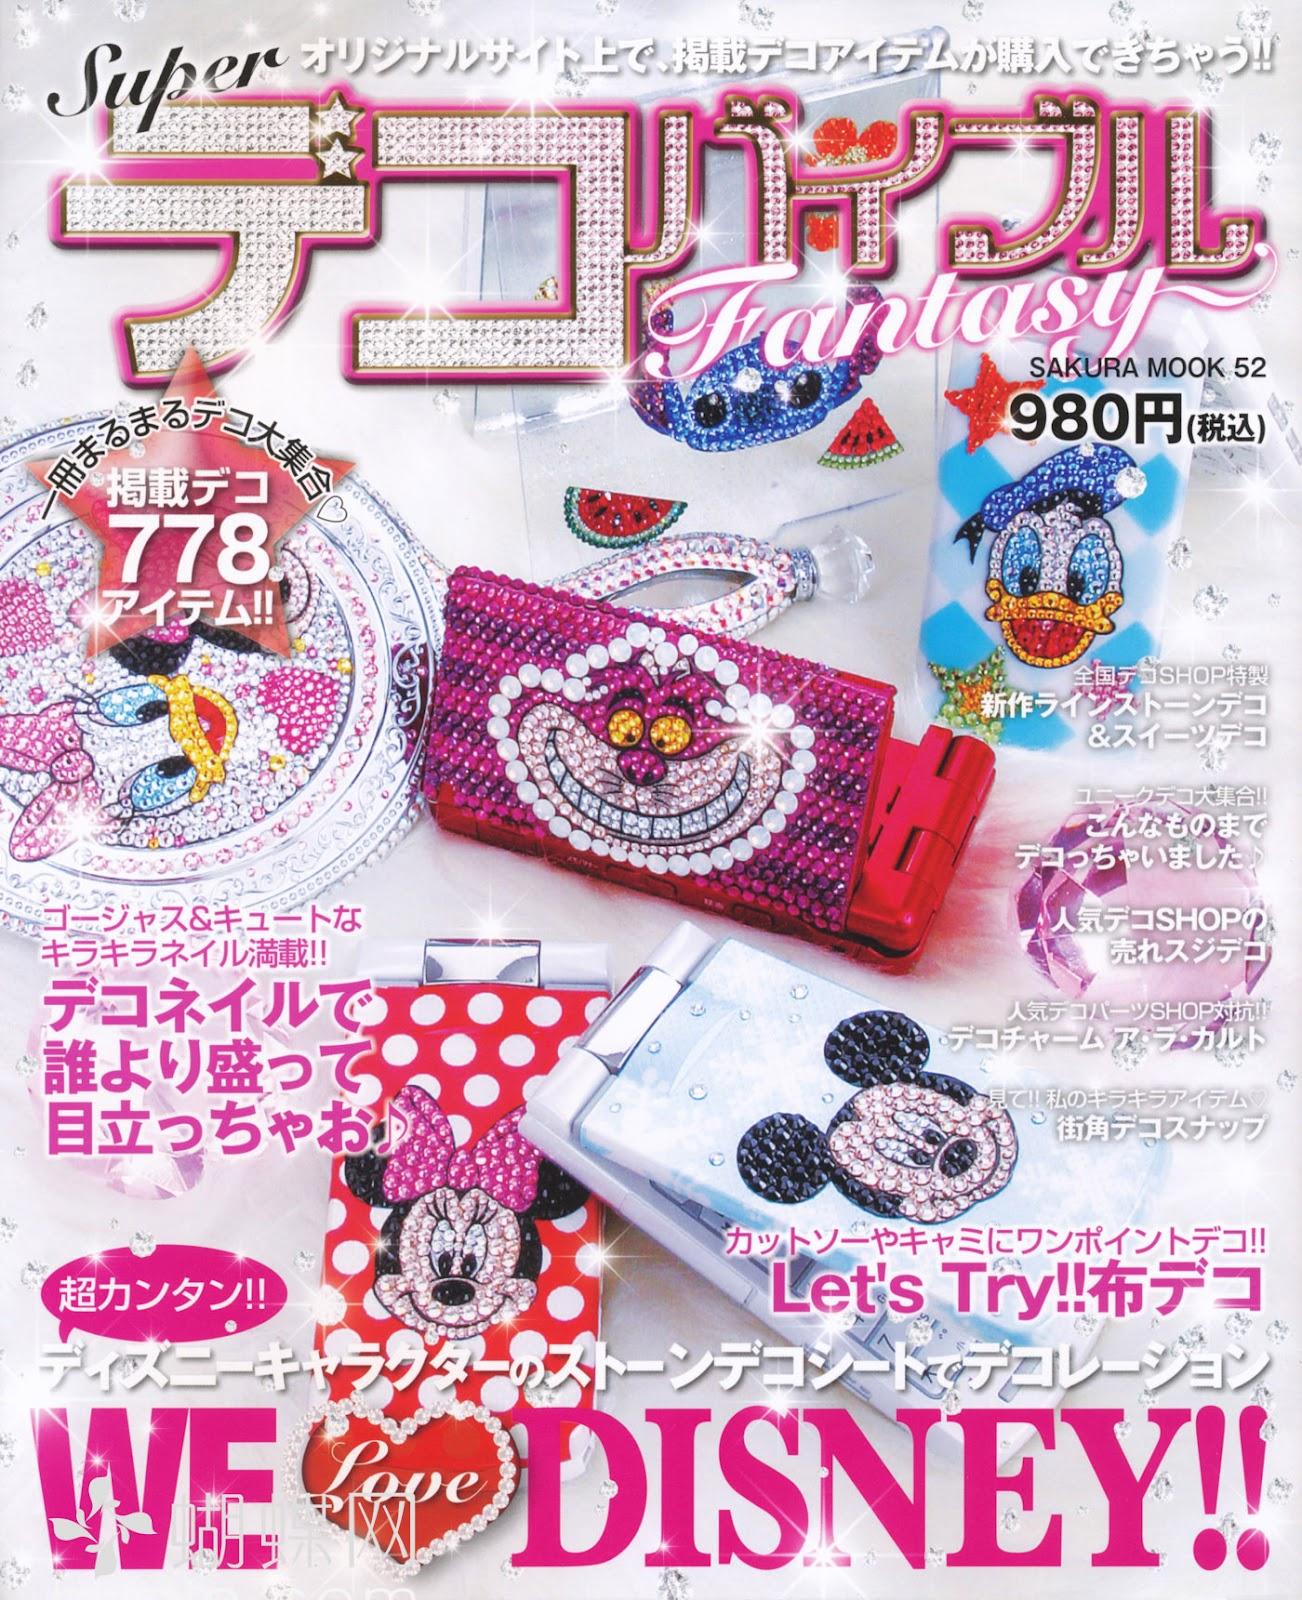 Super デコバイブル Decorating Bible Fantasy japanese magazine scans